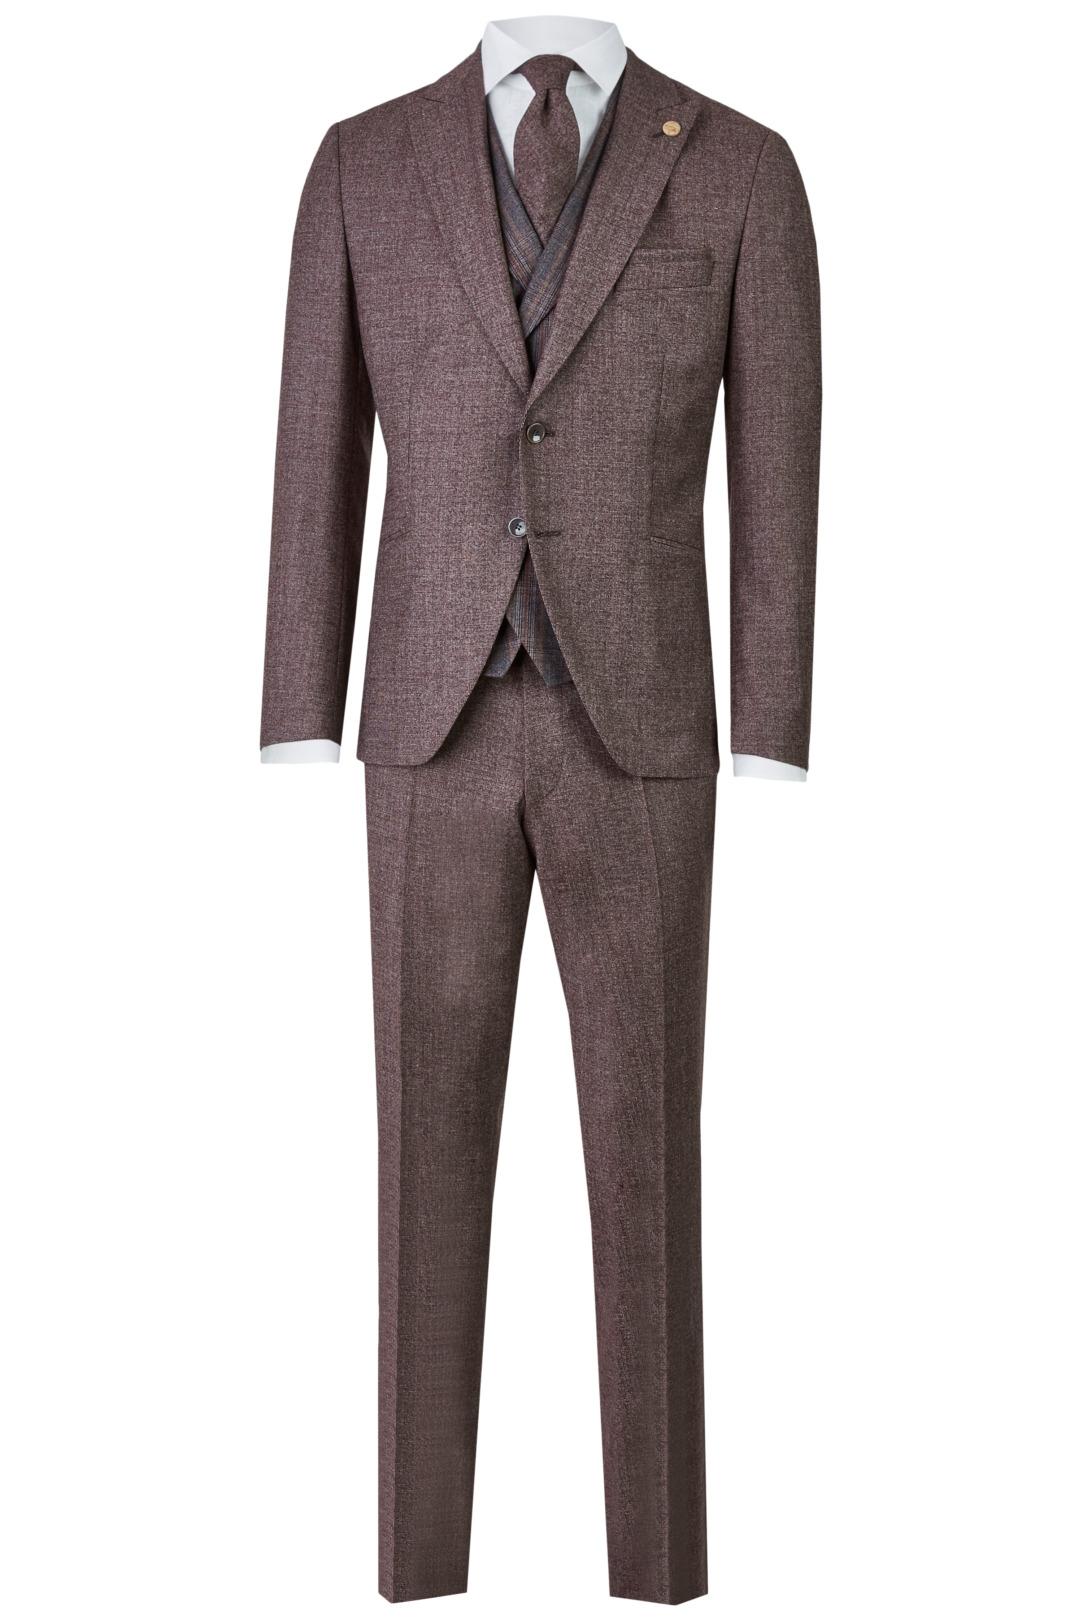 Wilvorst Green Wedding Hochzeitsanzug Männer Mode Bräutigam klassische Form vintage boho Stil rot bordeaux wil_0121_otf_gw-look-3_1